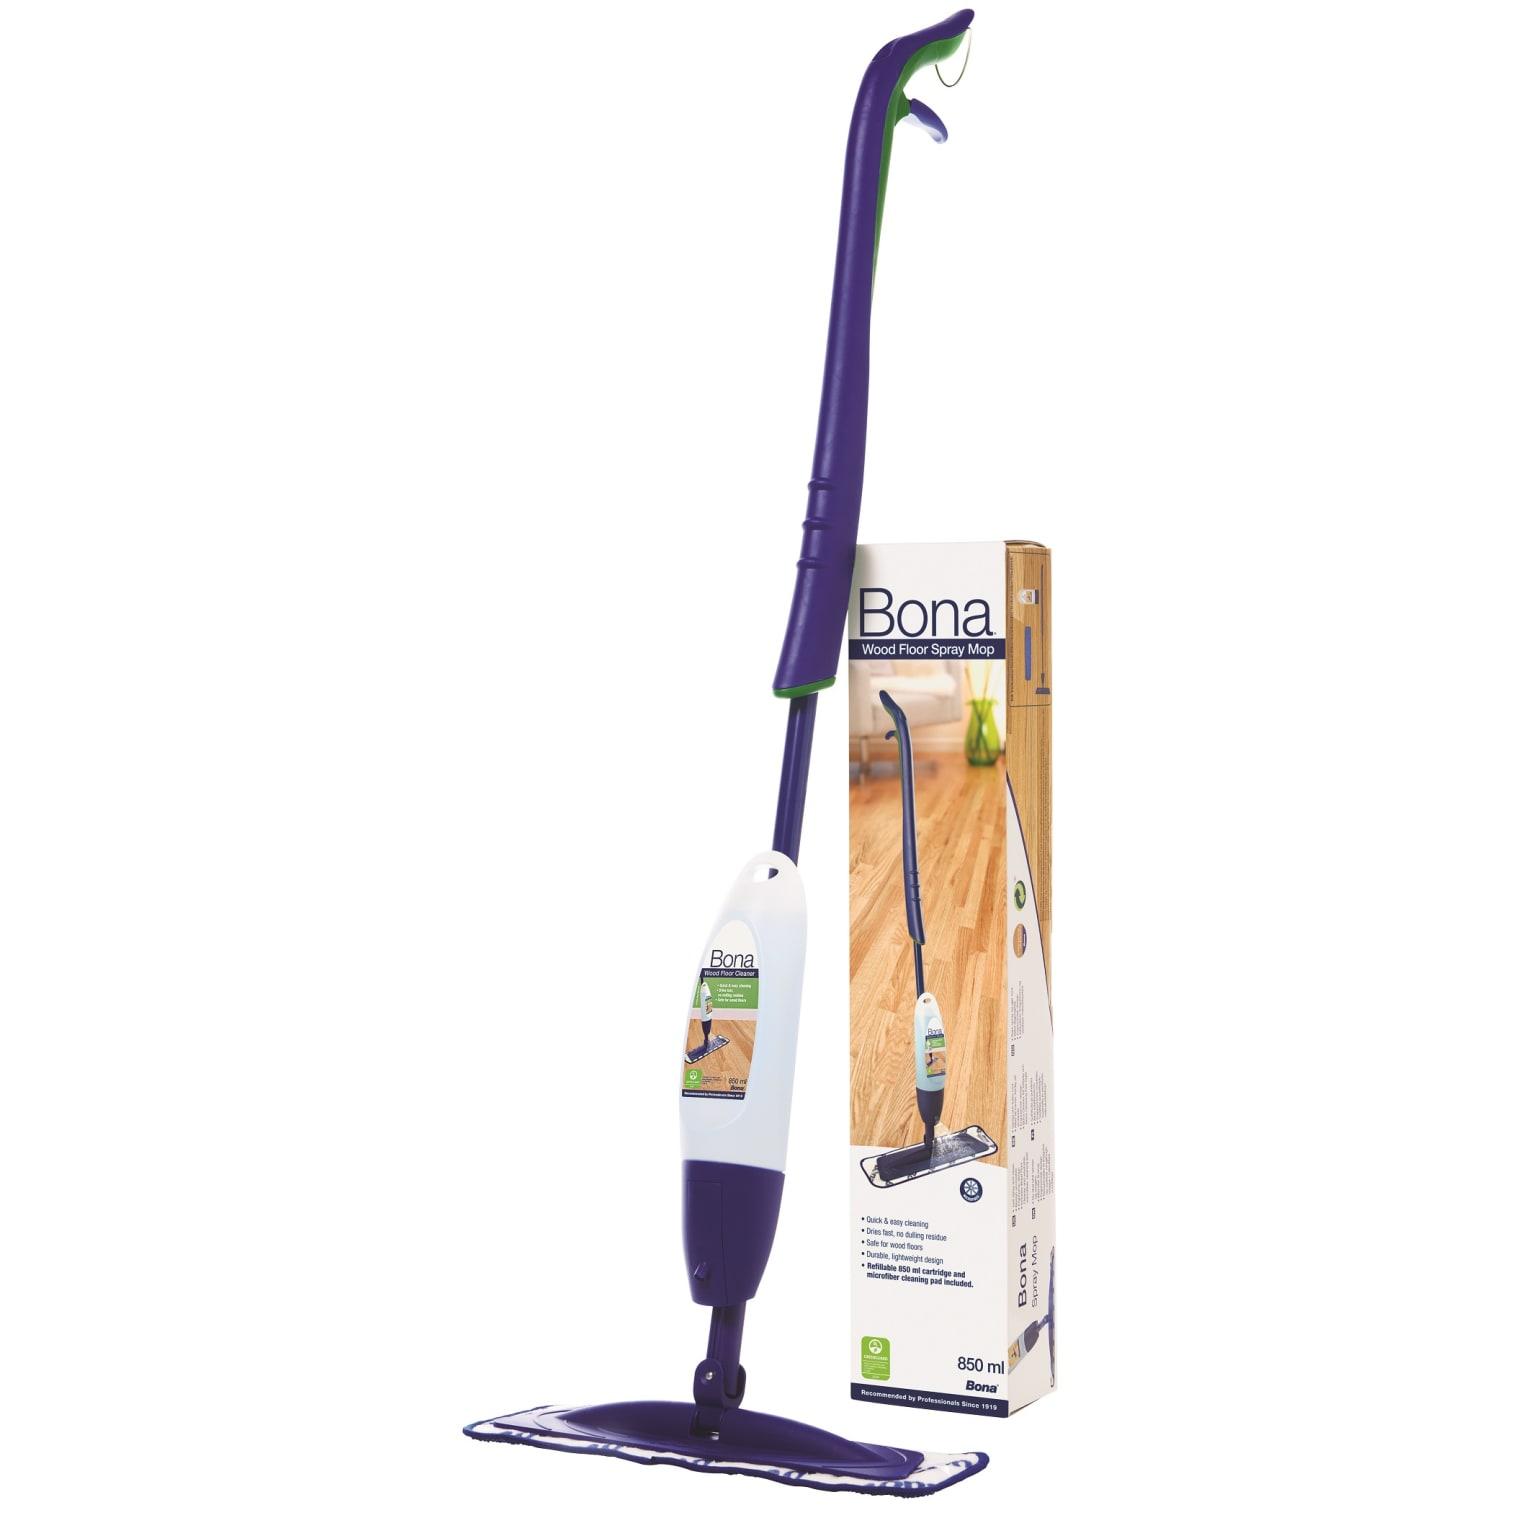 Introducing the Bona Oiled Floor Spray Mop